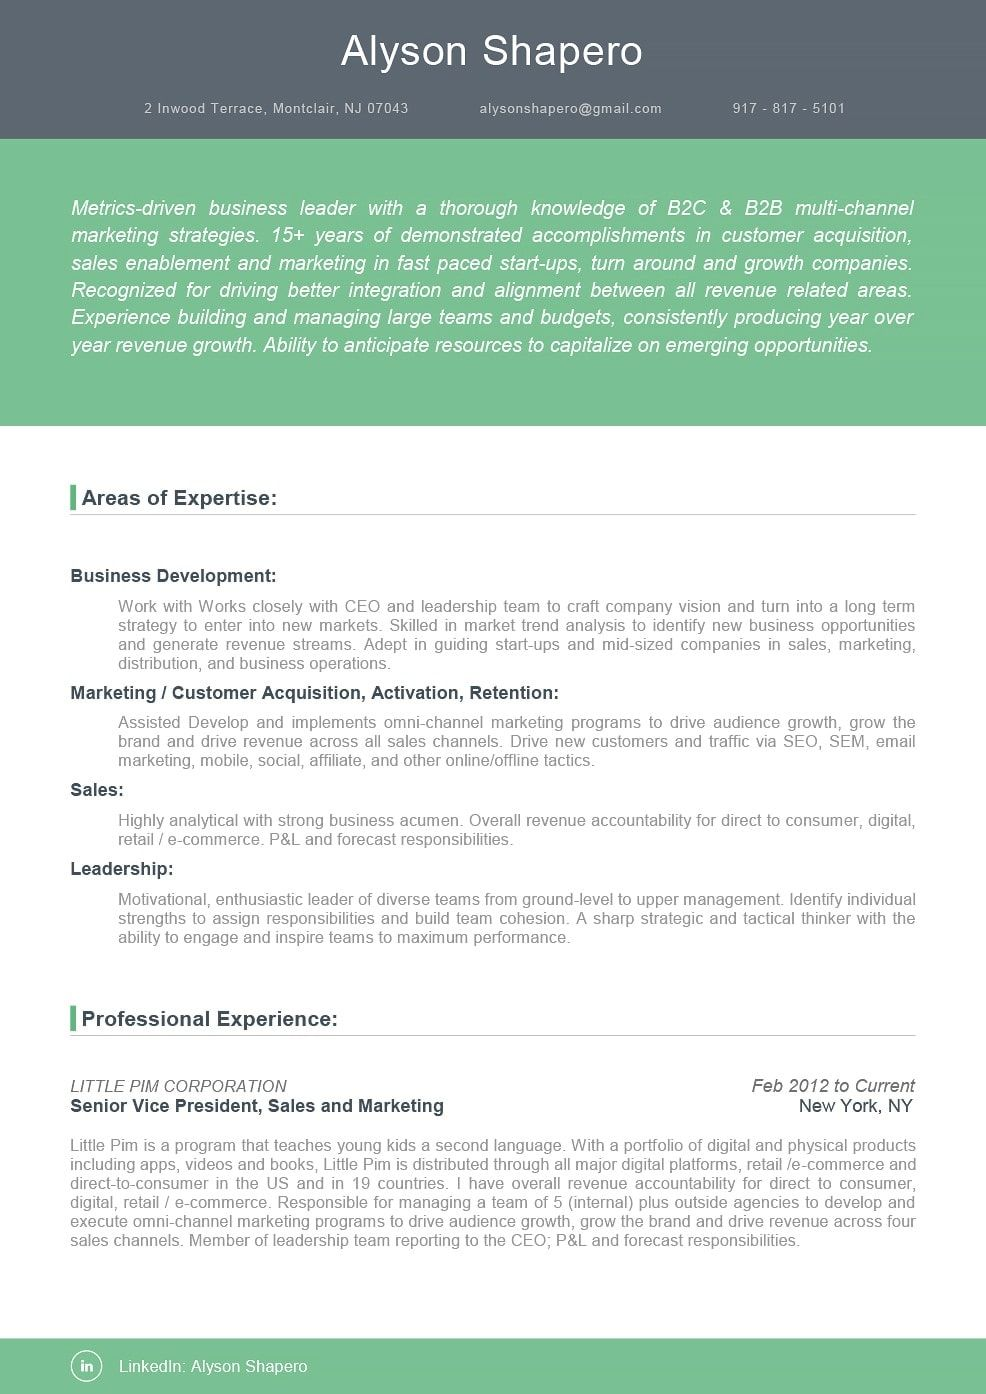 Resume Template 110380 Resume design template, Best